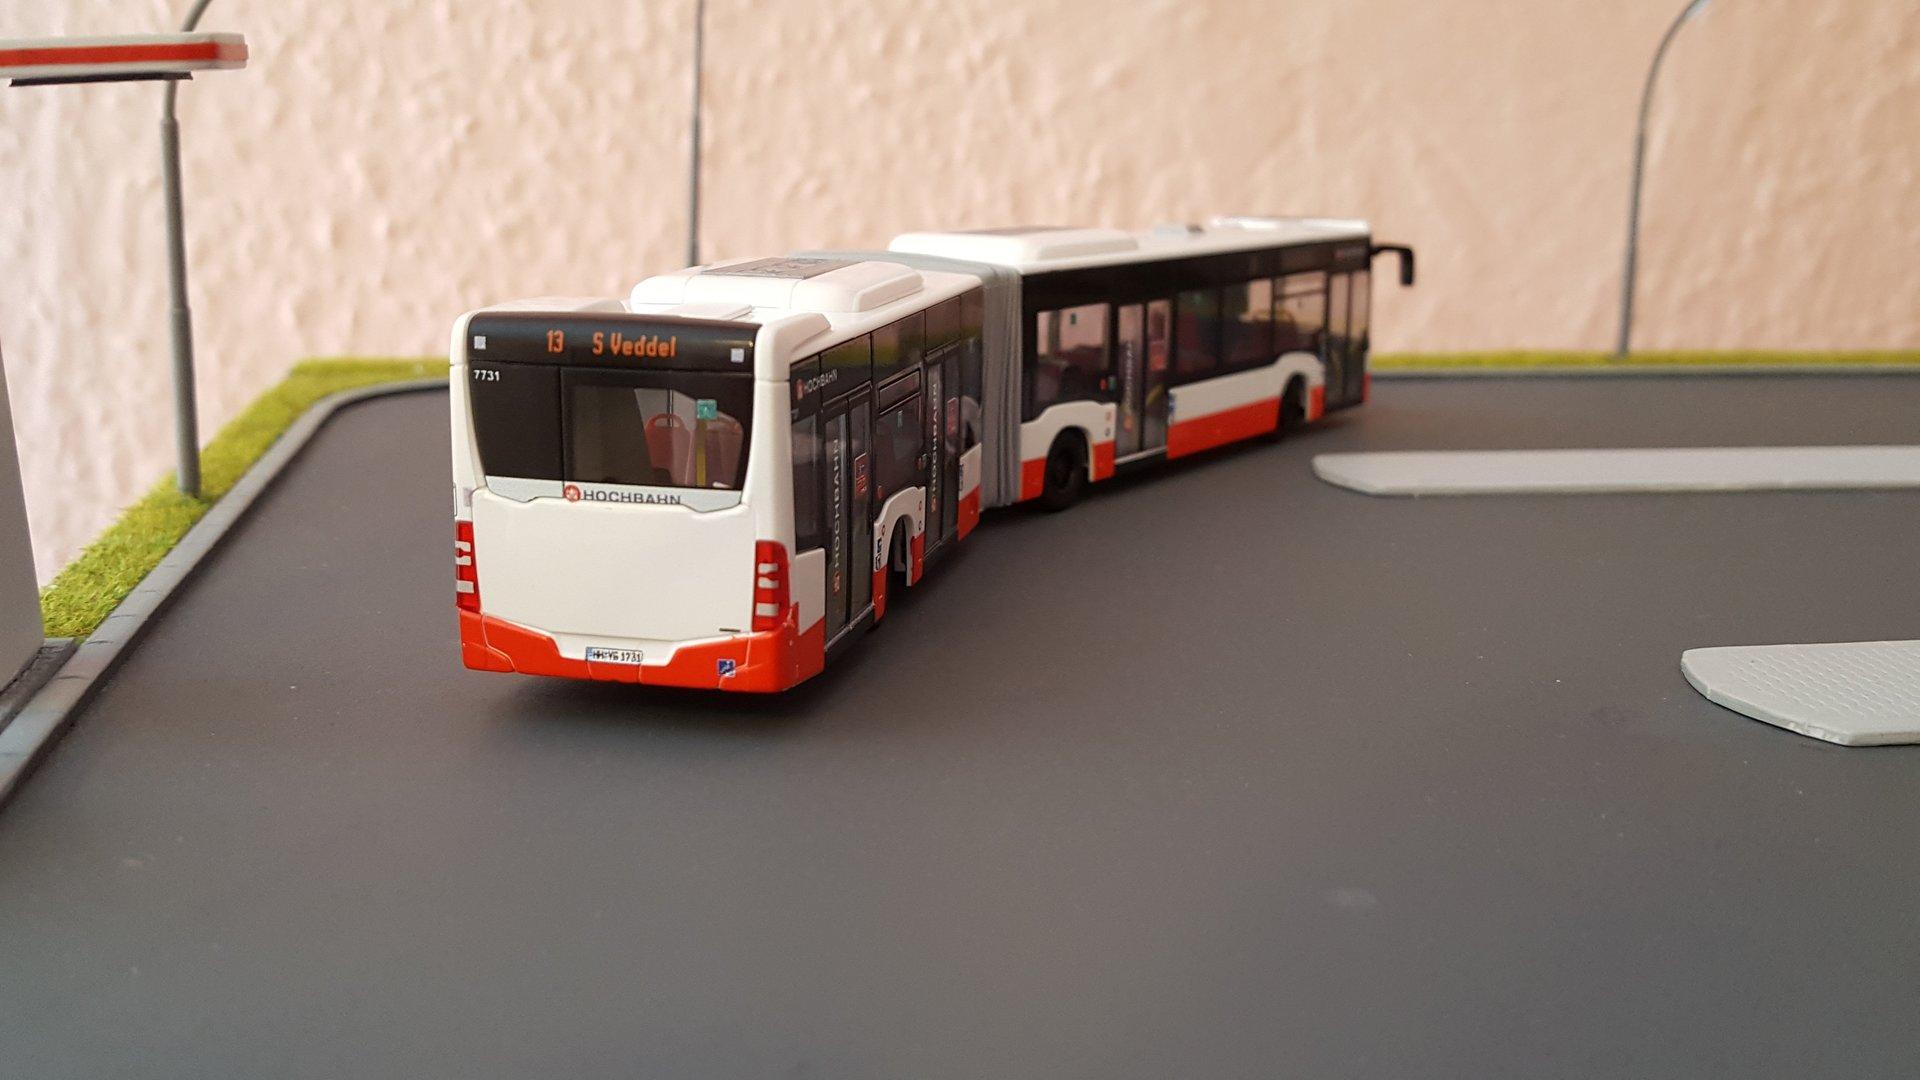 mb 7731.jpg